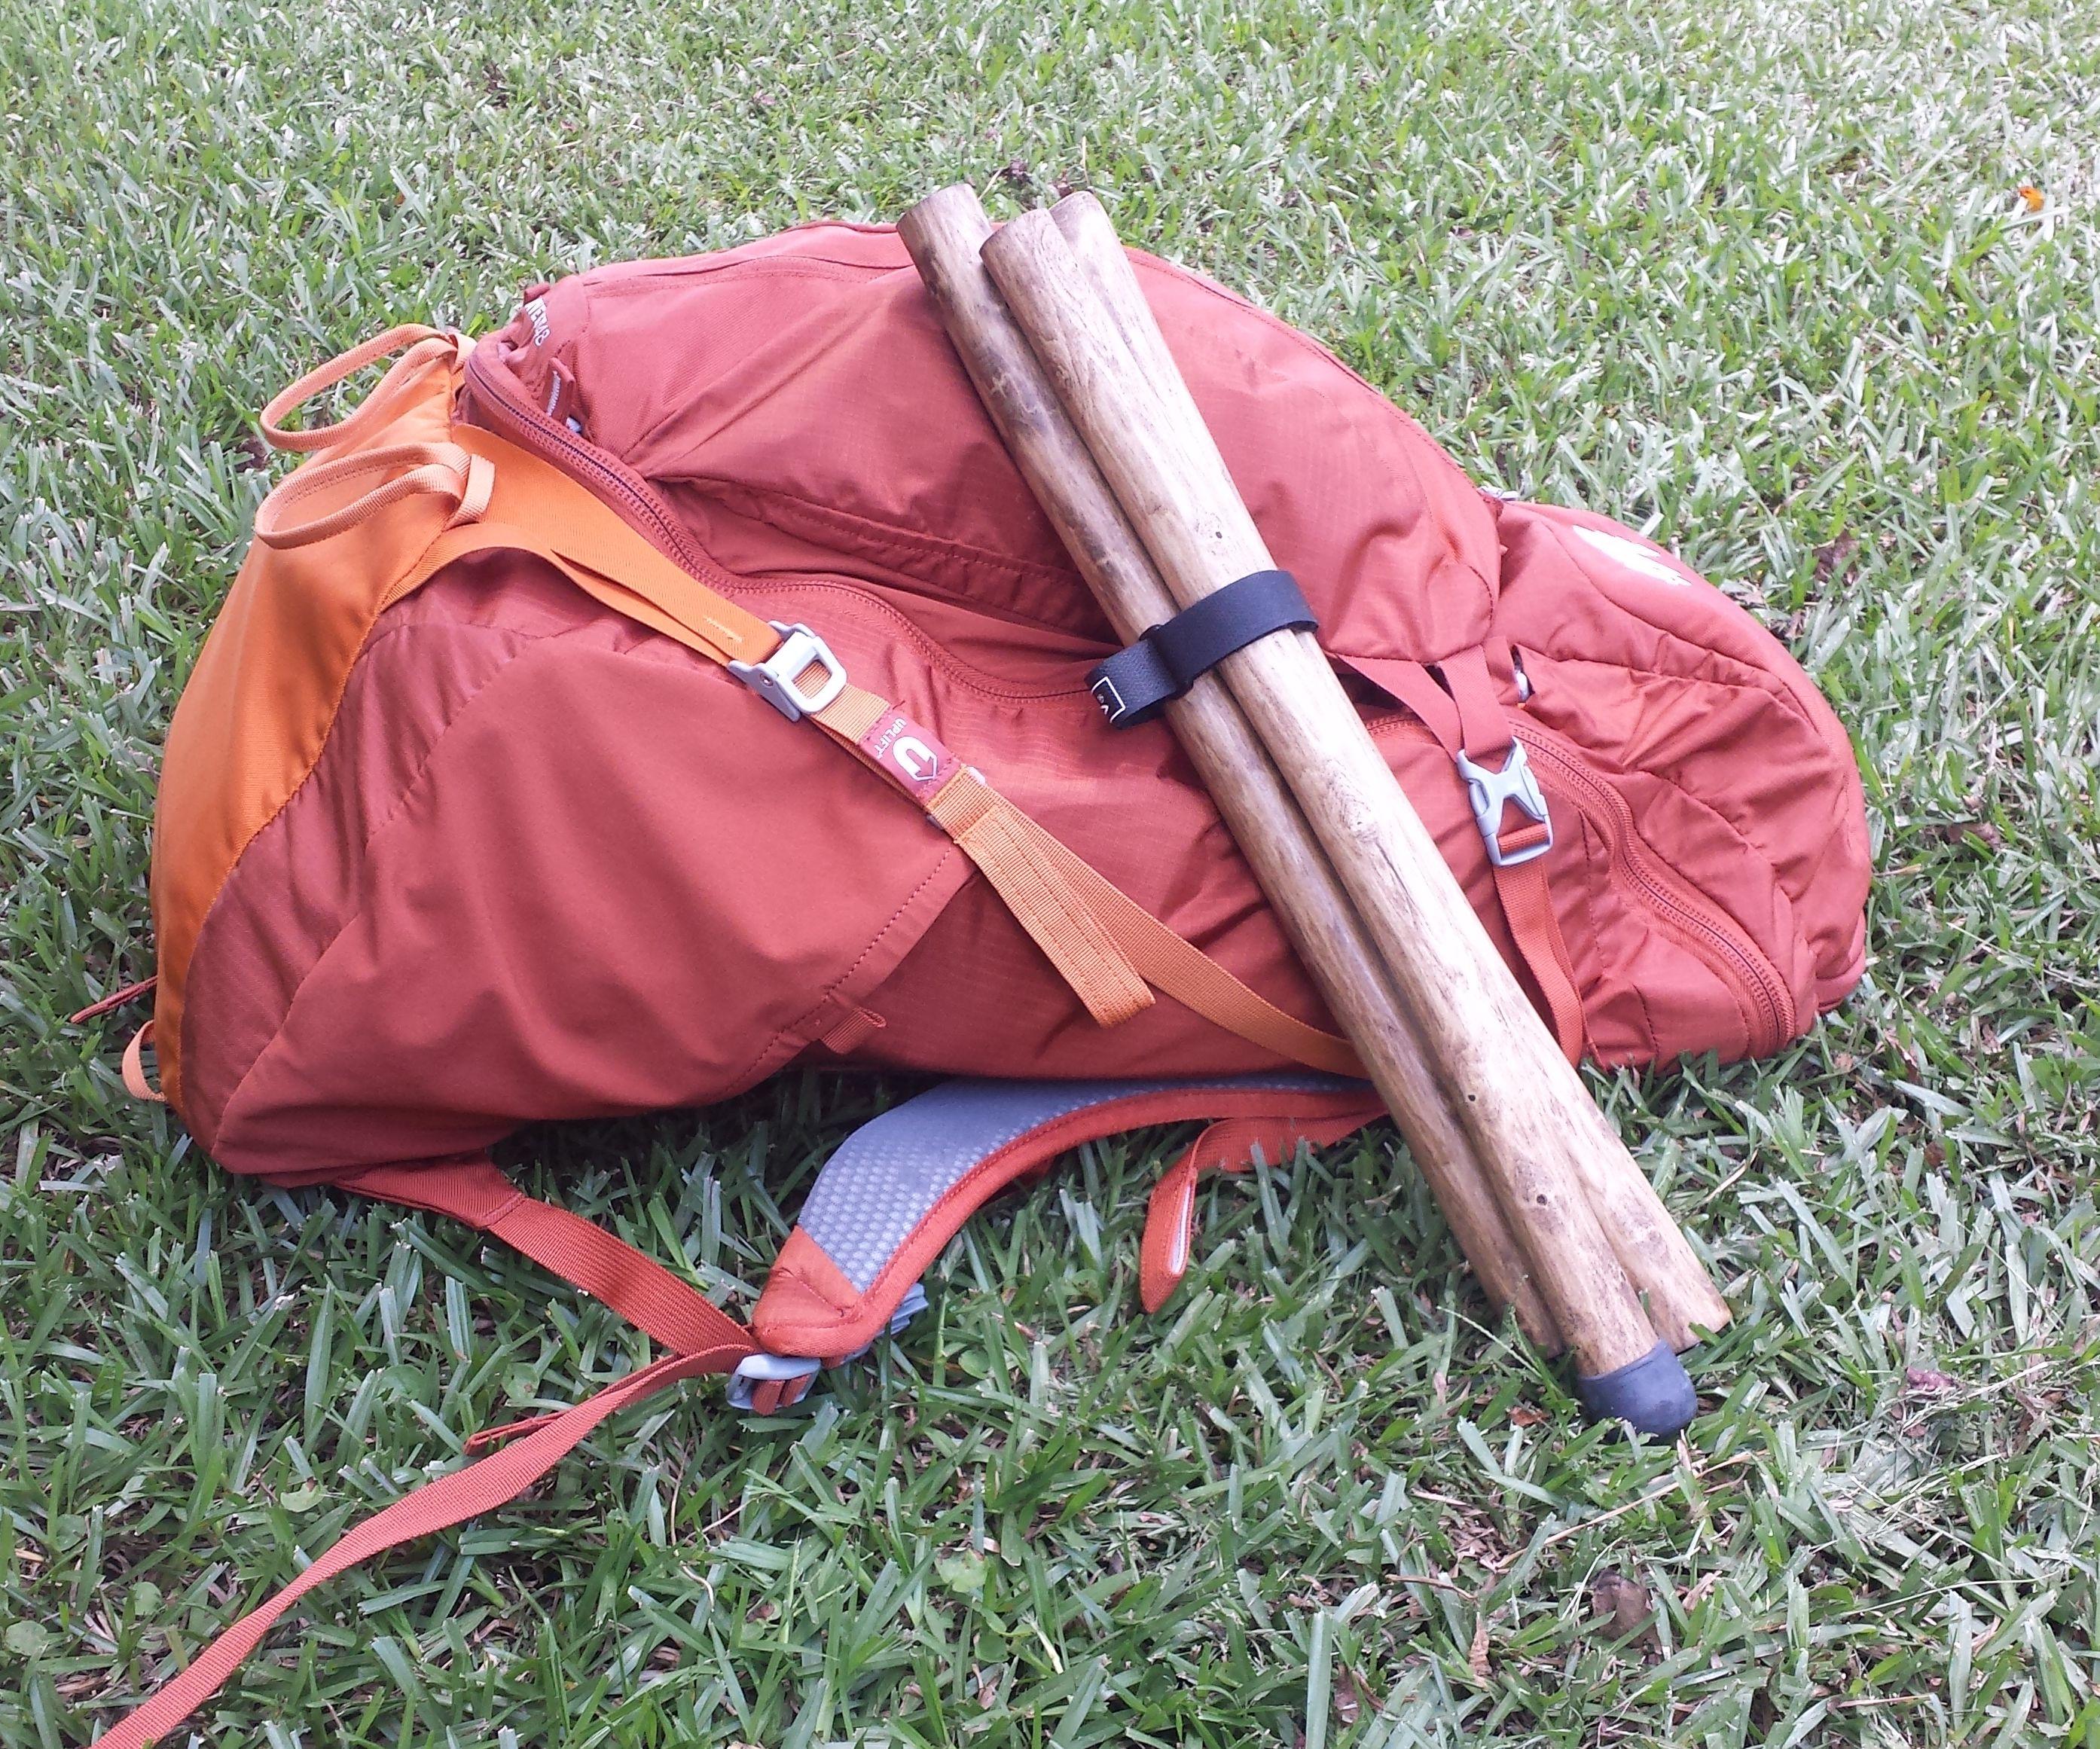 Compact walking stick